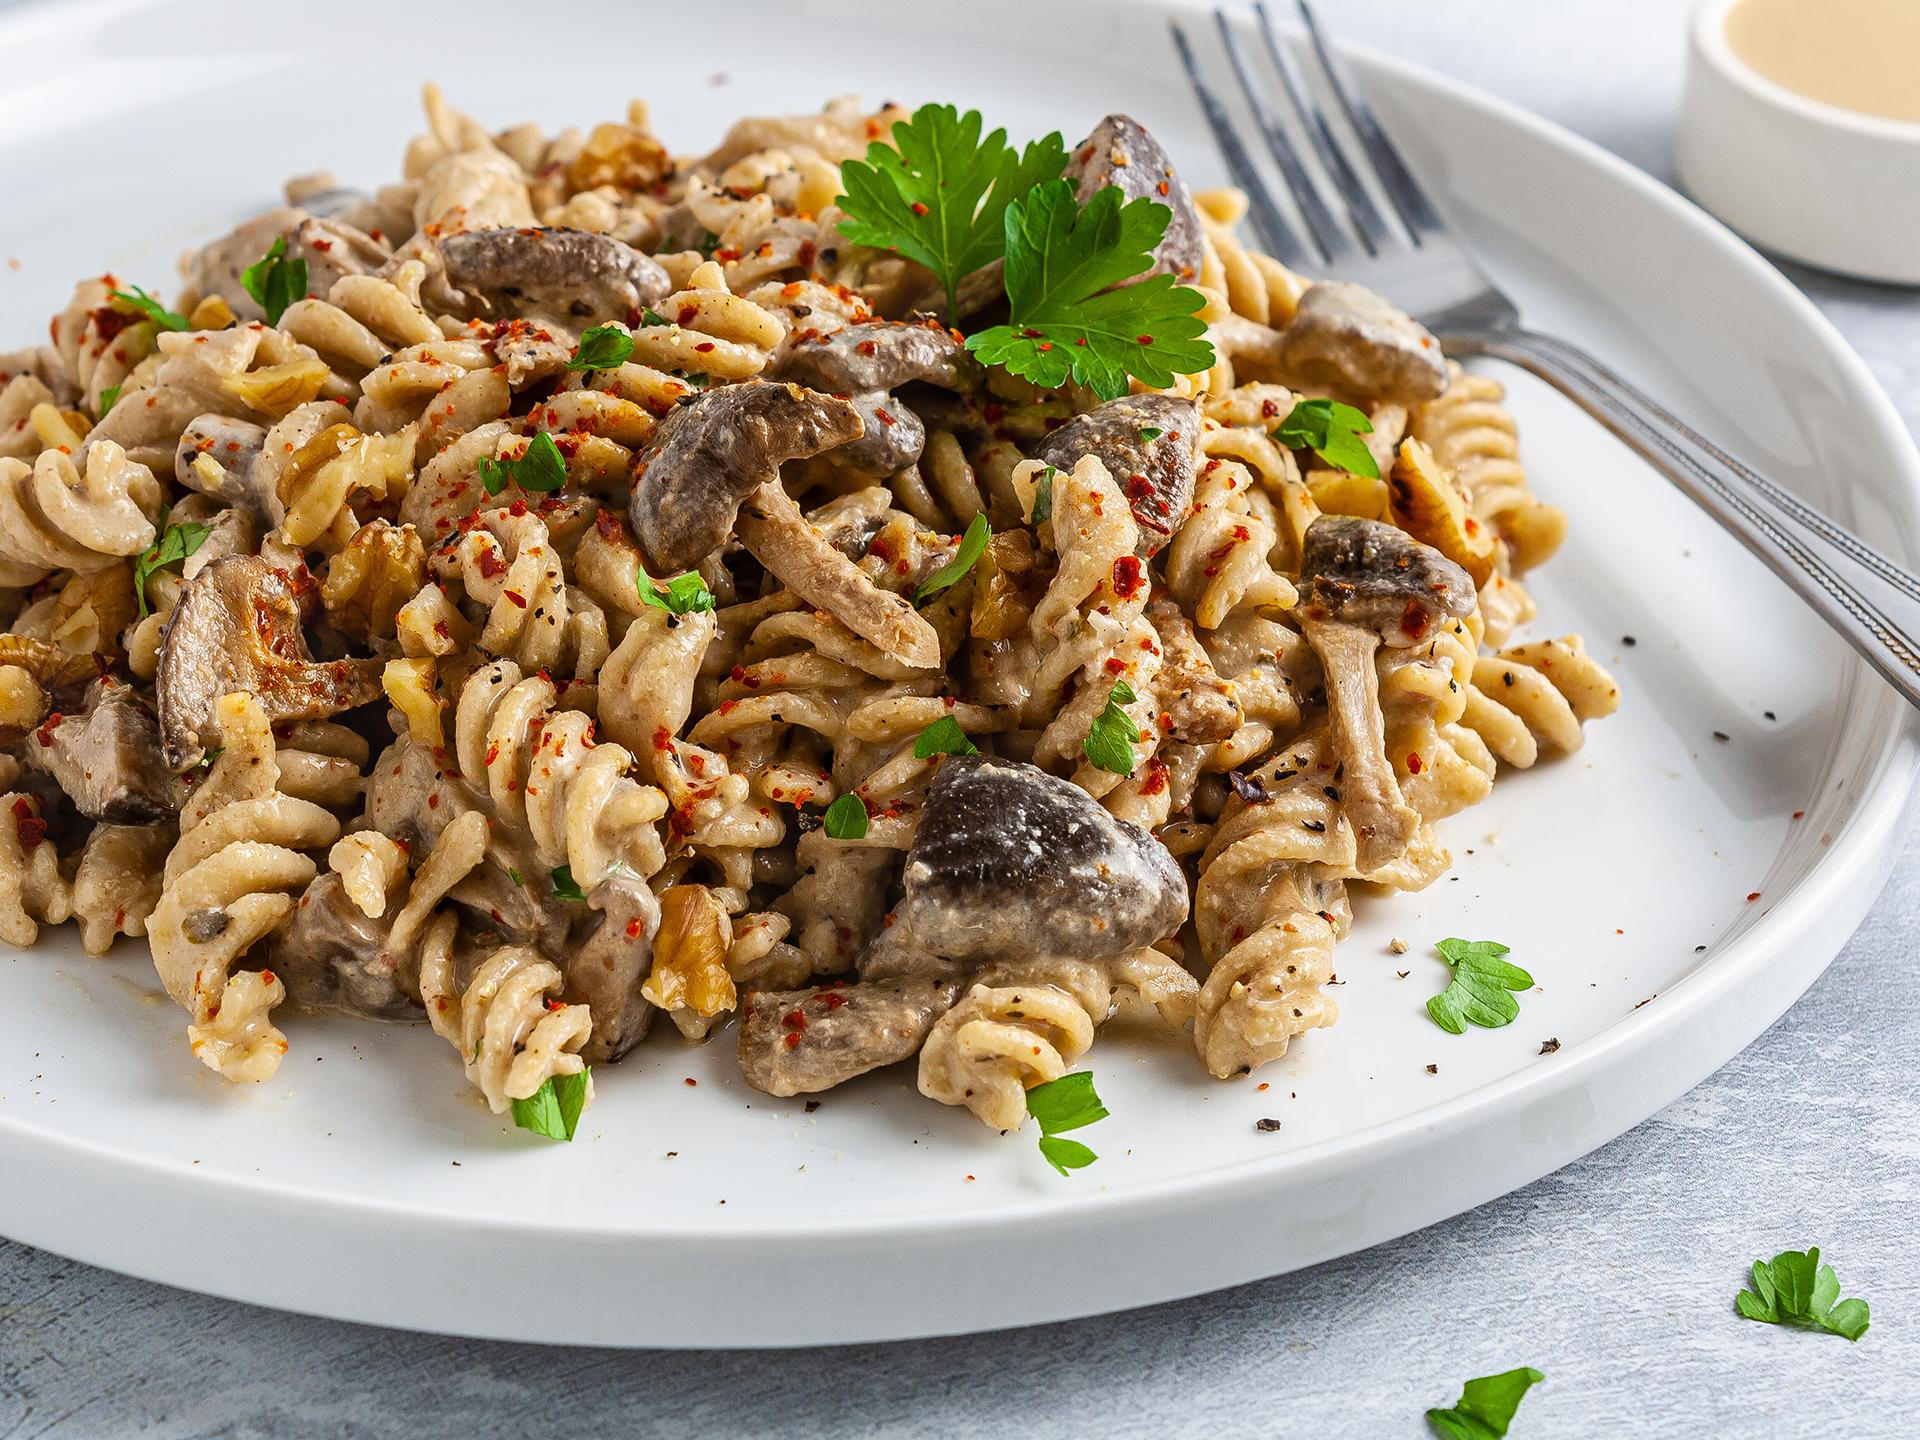 Vegan No Cream Tahini Pasta with Mushrooms